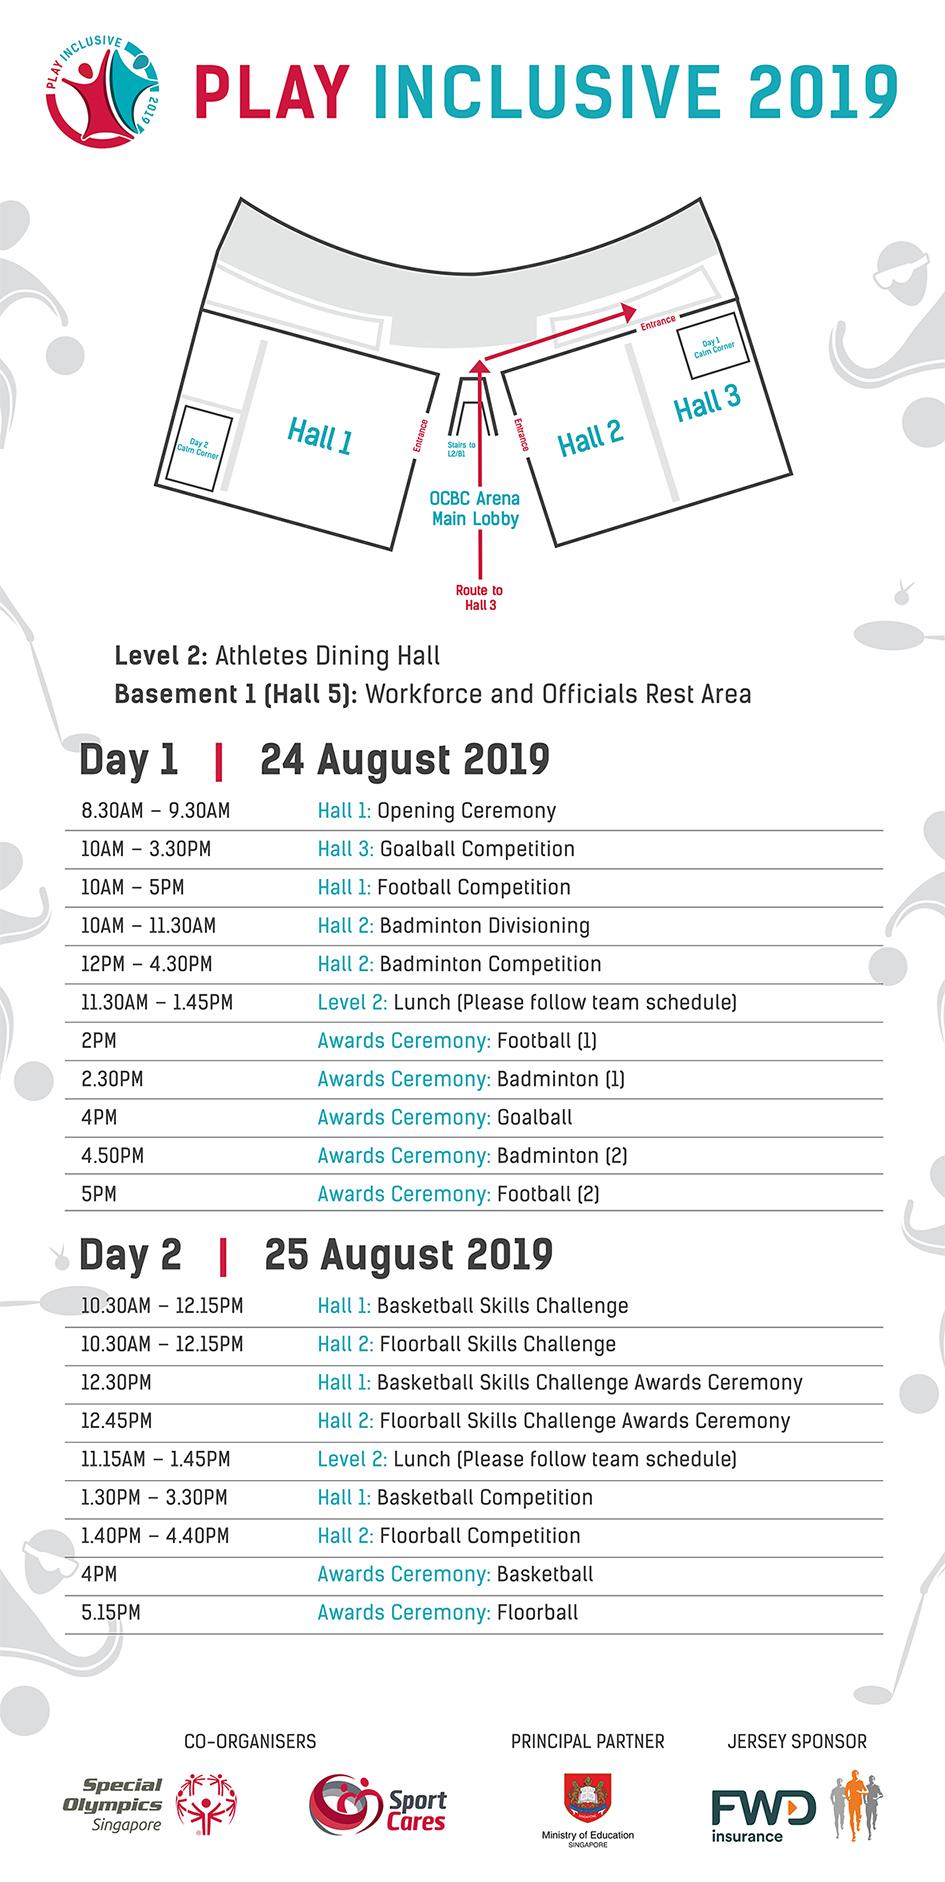 Play Inclusive 2019 General Schedule